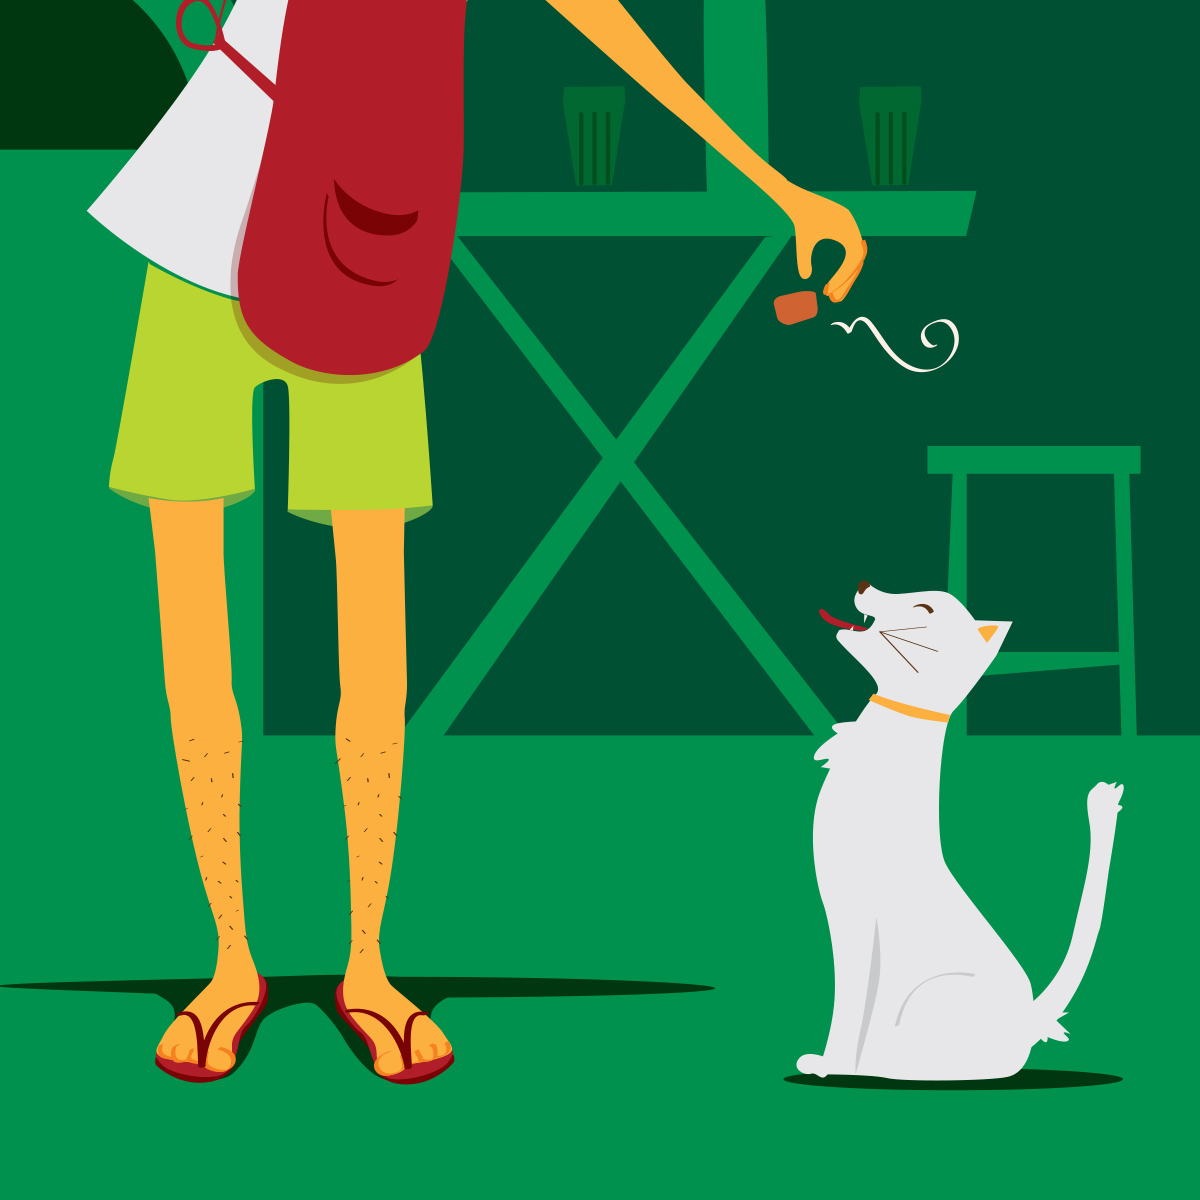 ilustra-gato